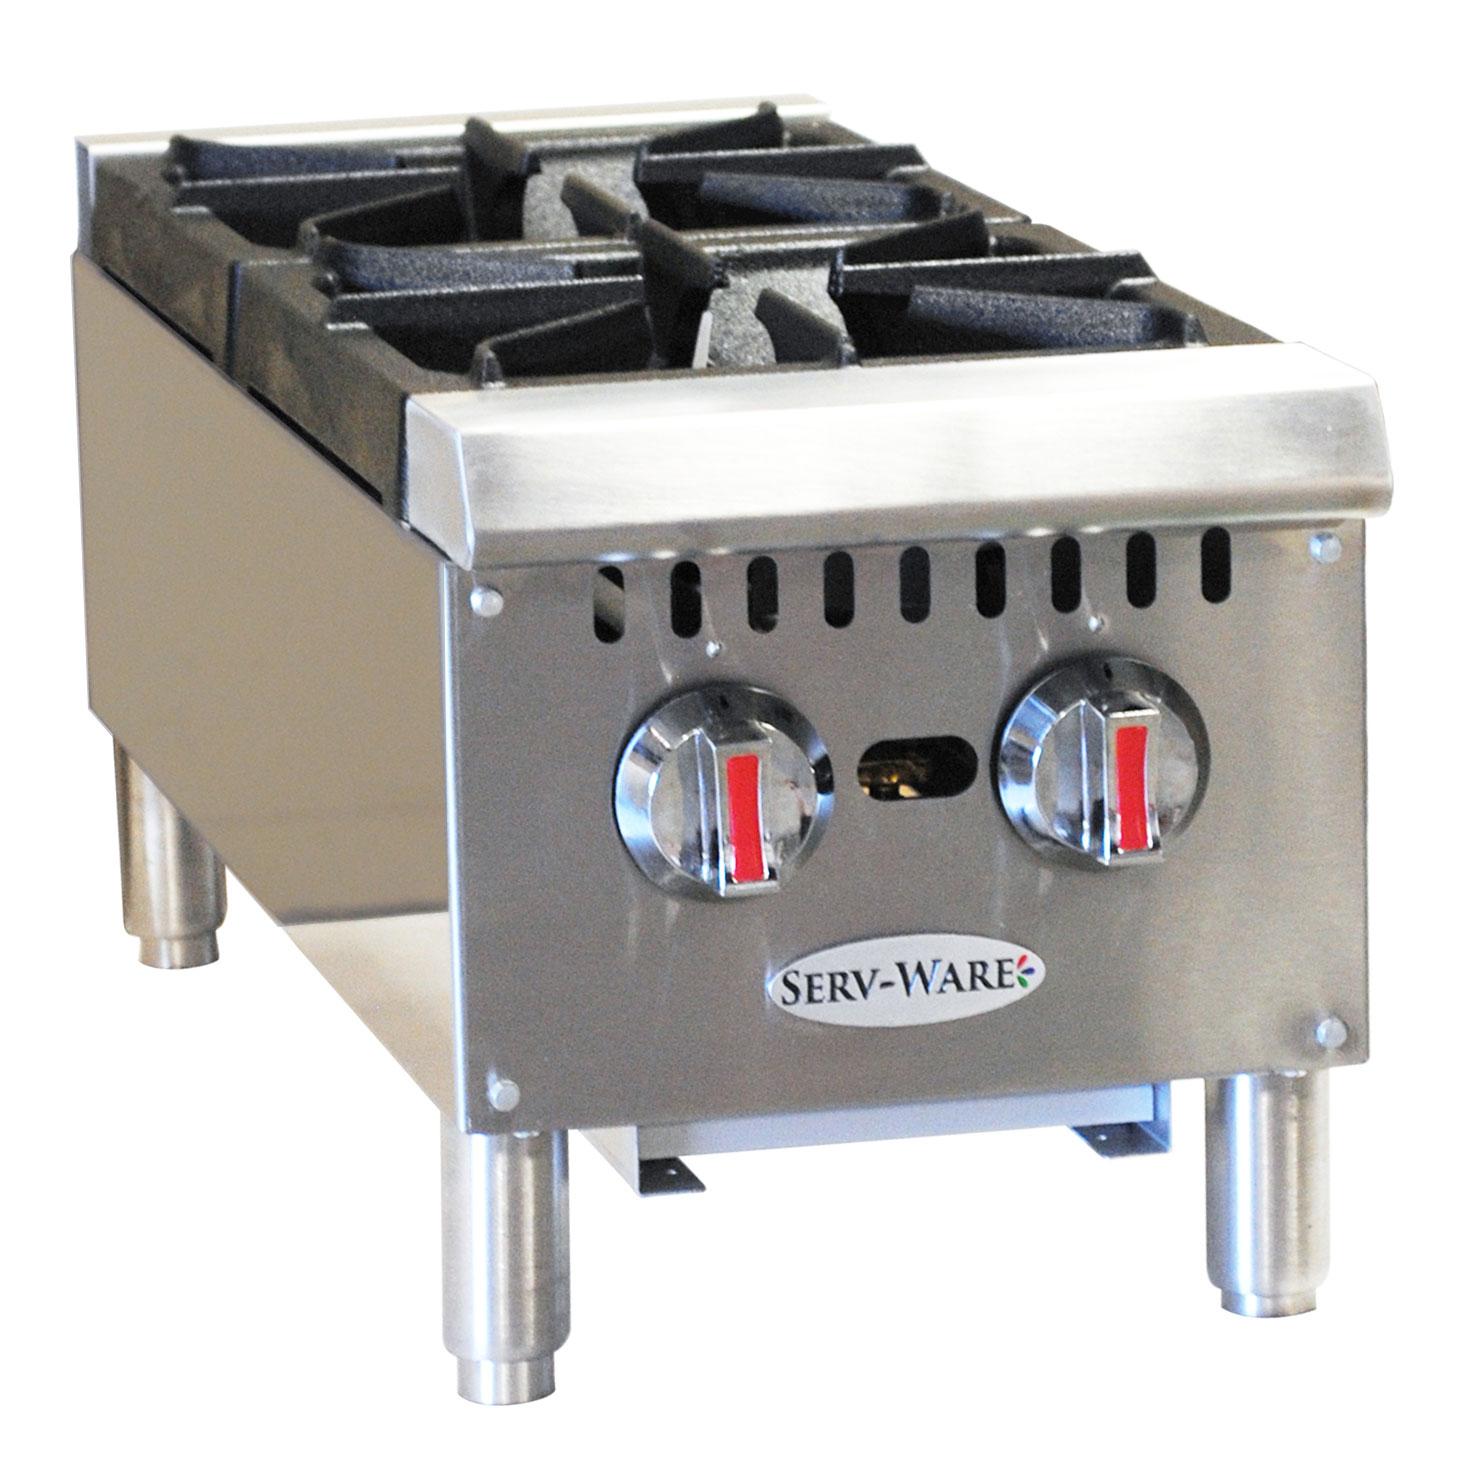 Serv-Ware SHPS-12 hotplate, countertop, gas